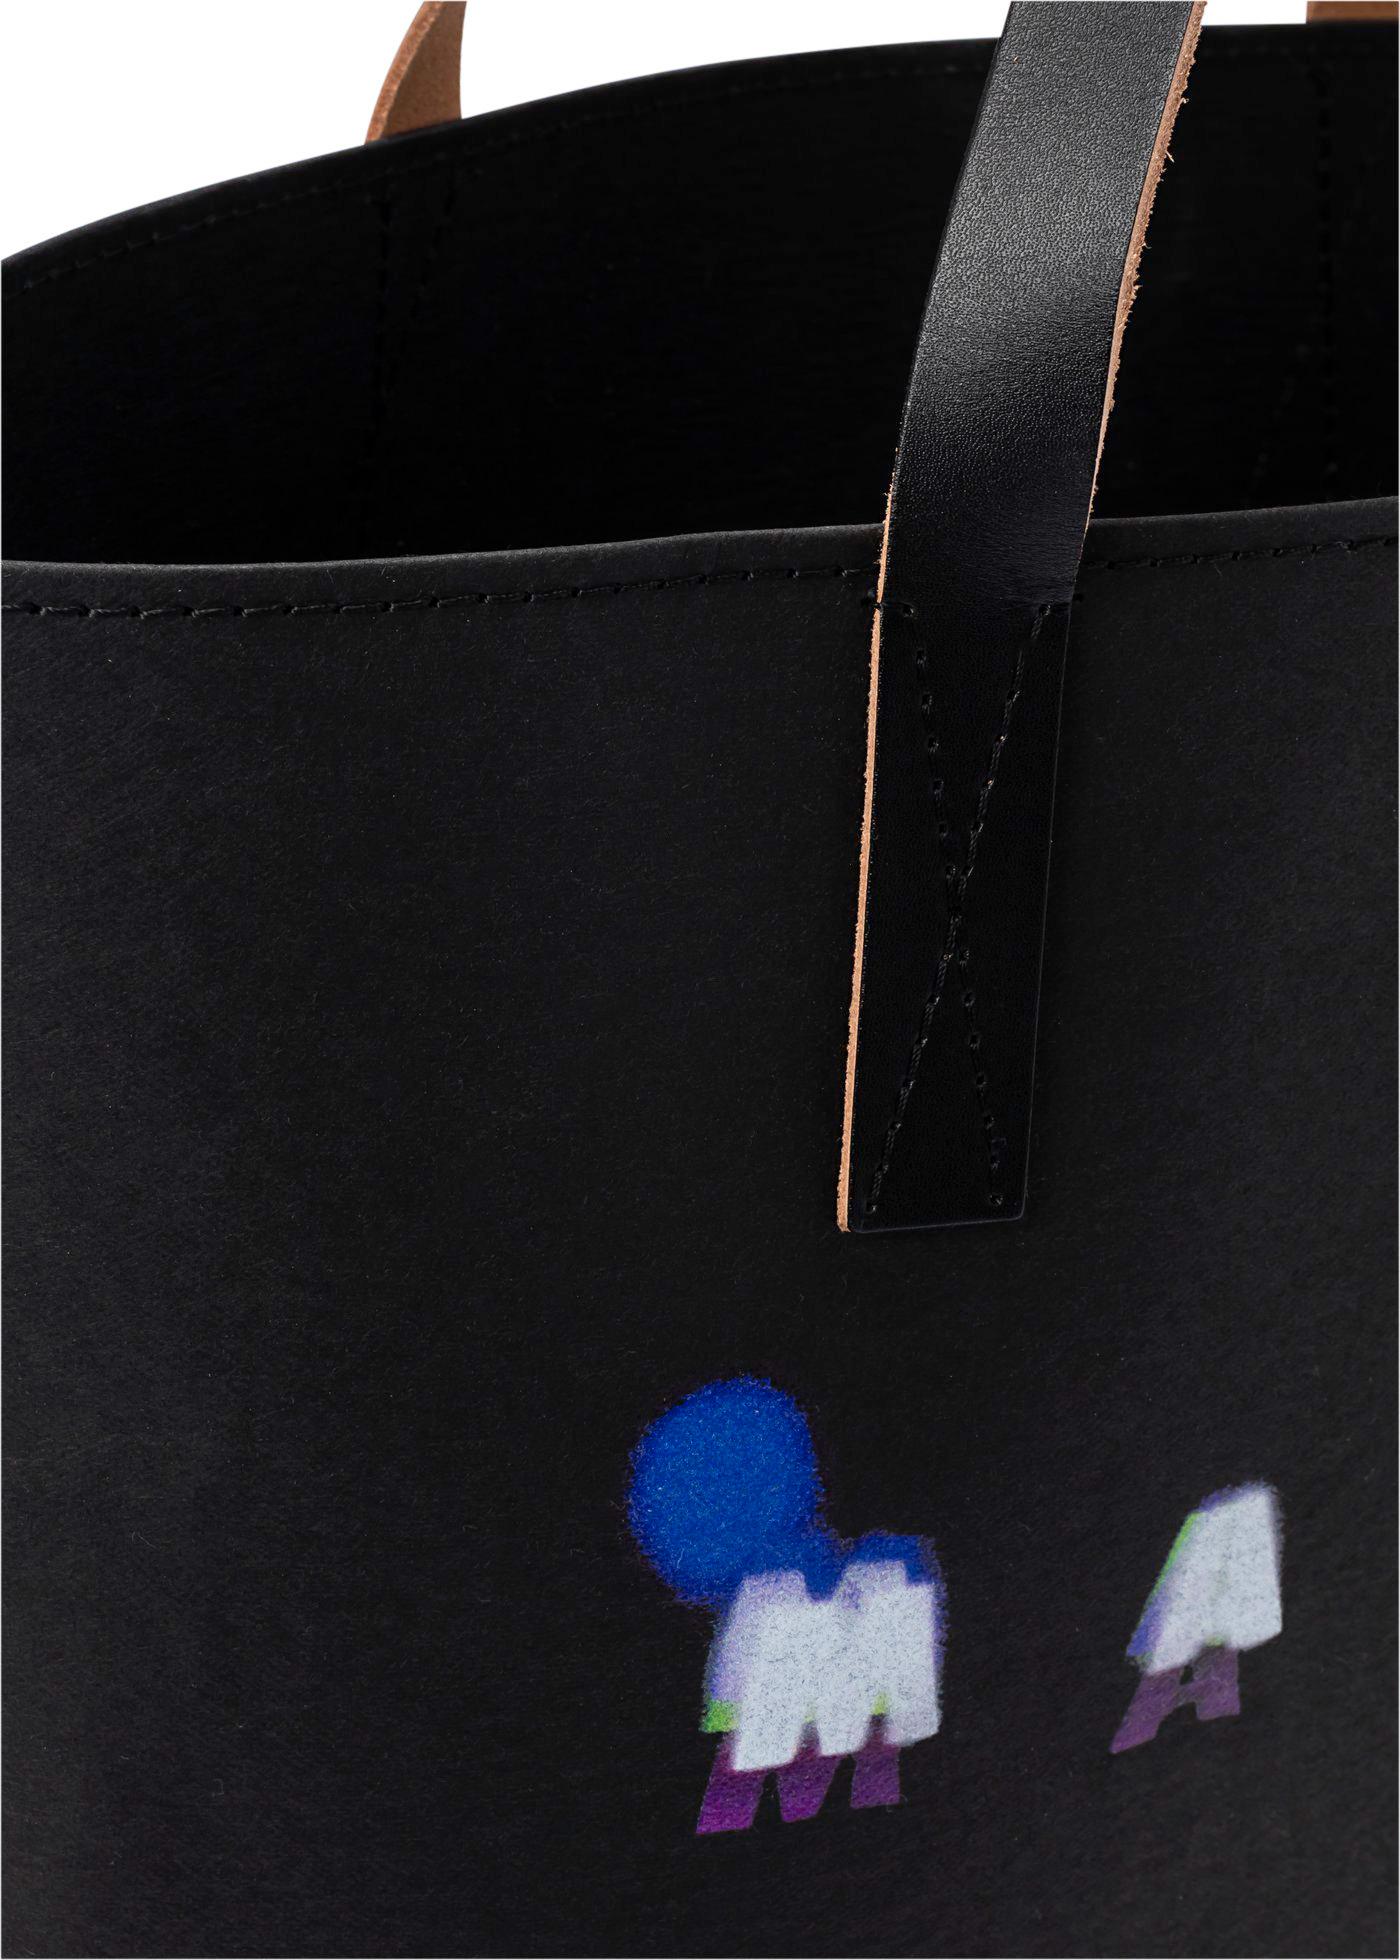 SHOPPING BAG image number 2